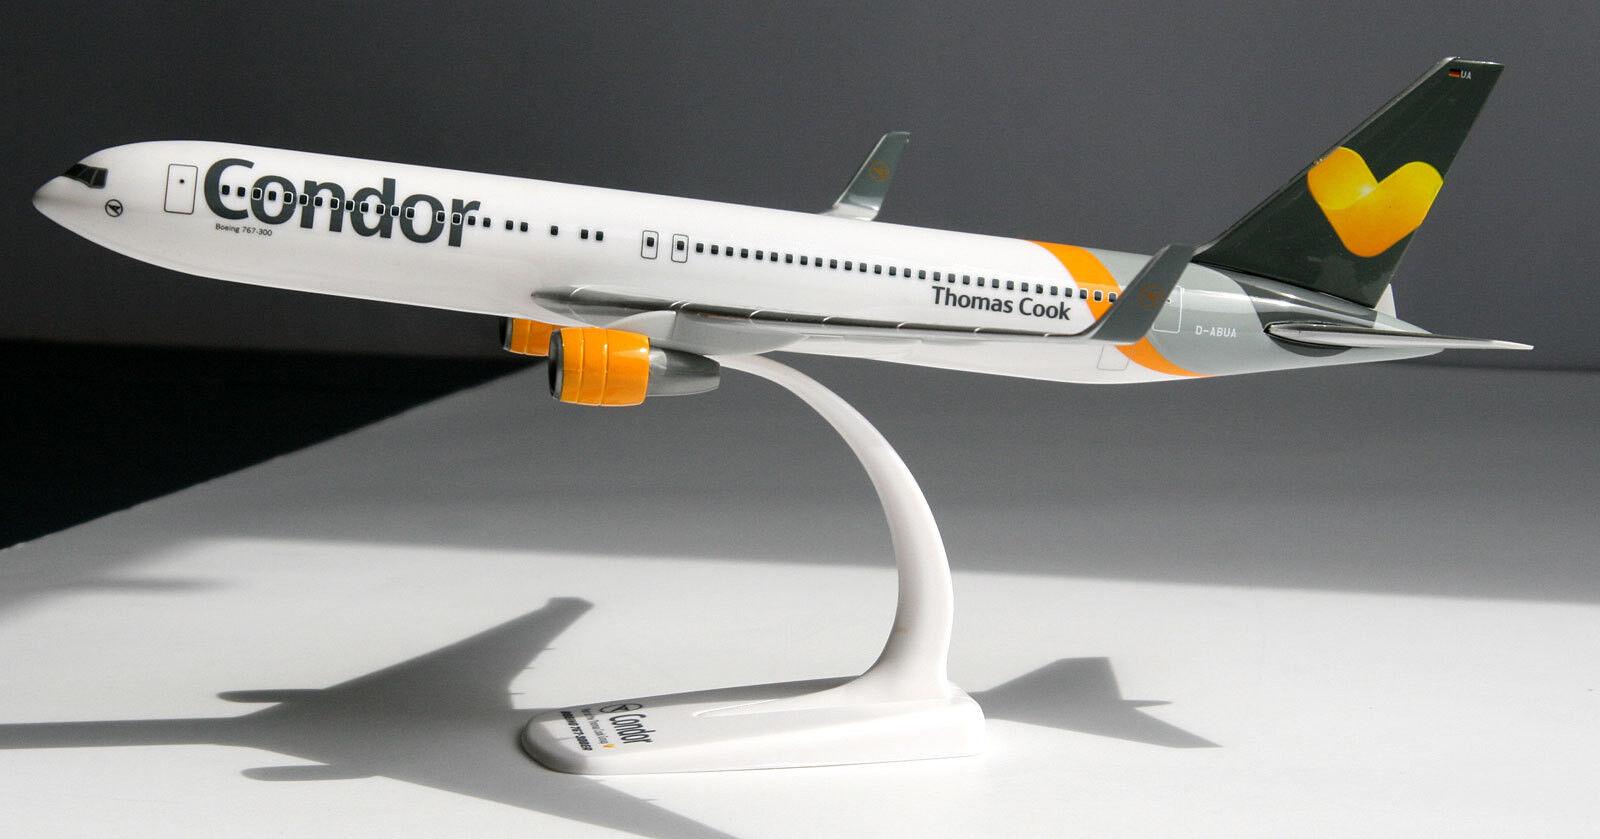 Condor Condor Condor Boeing 767-300ER 1 200 Herpa Snap-Fit 610865 Flugzeug B767 Thomas Cook 7da1c9